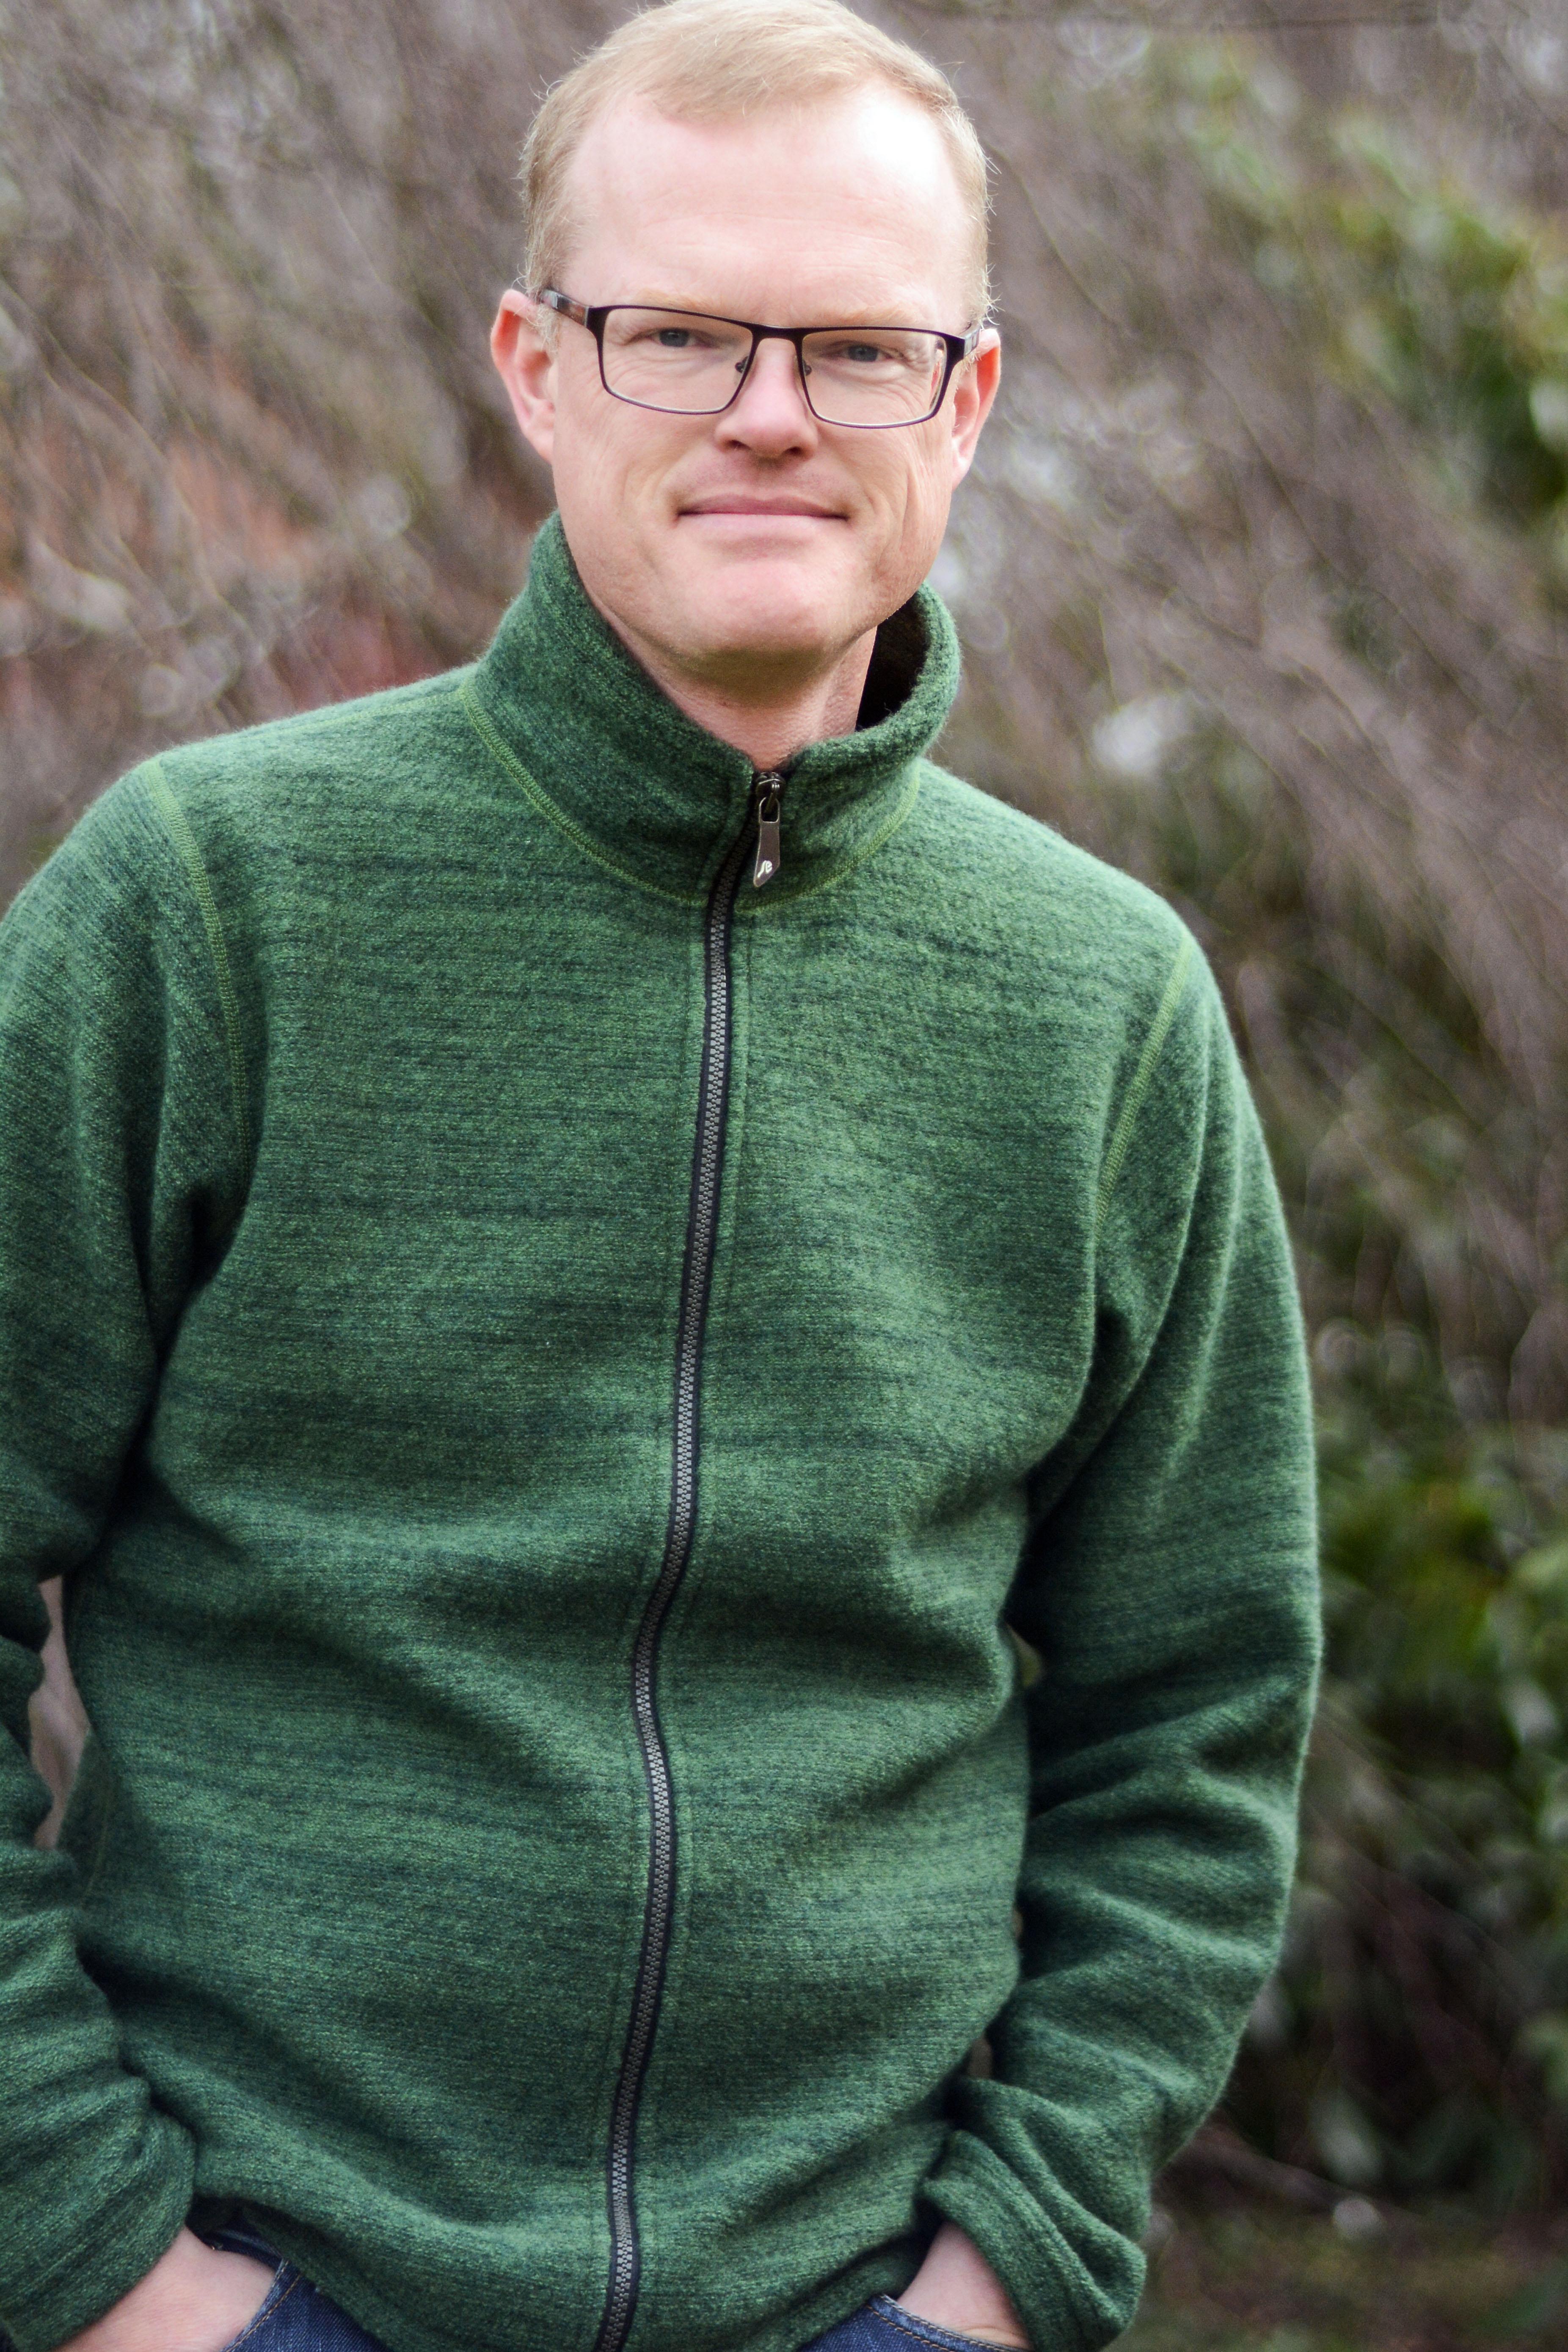 Cristian Abrahamsson